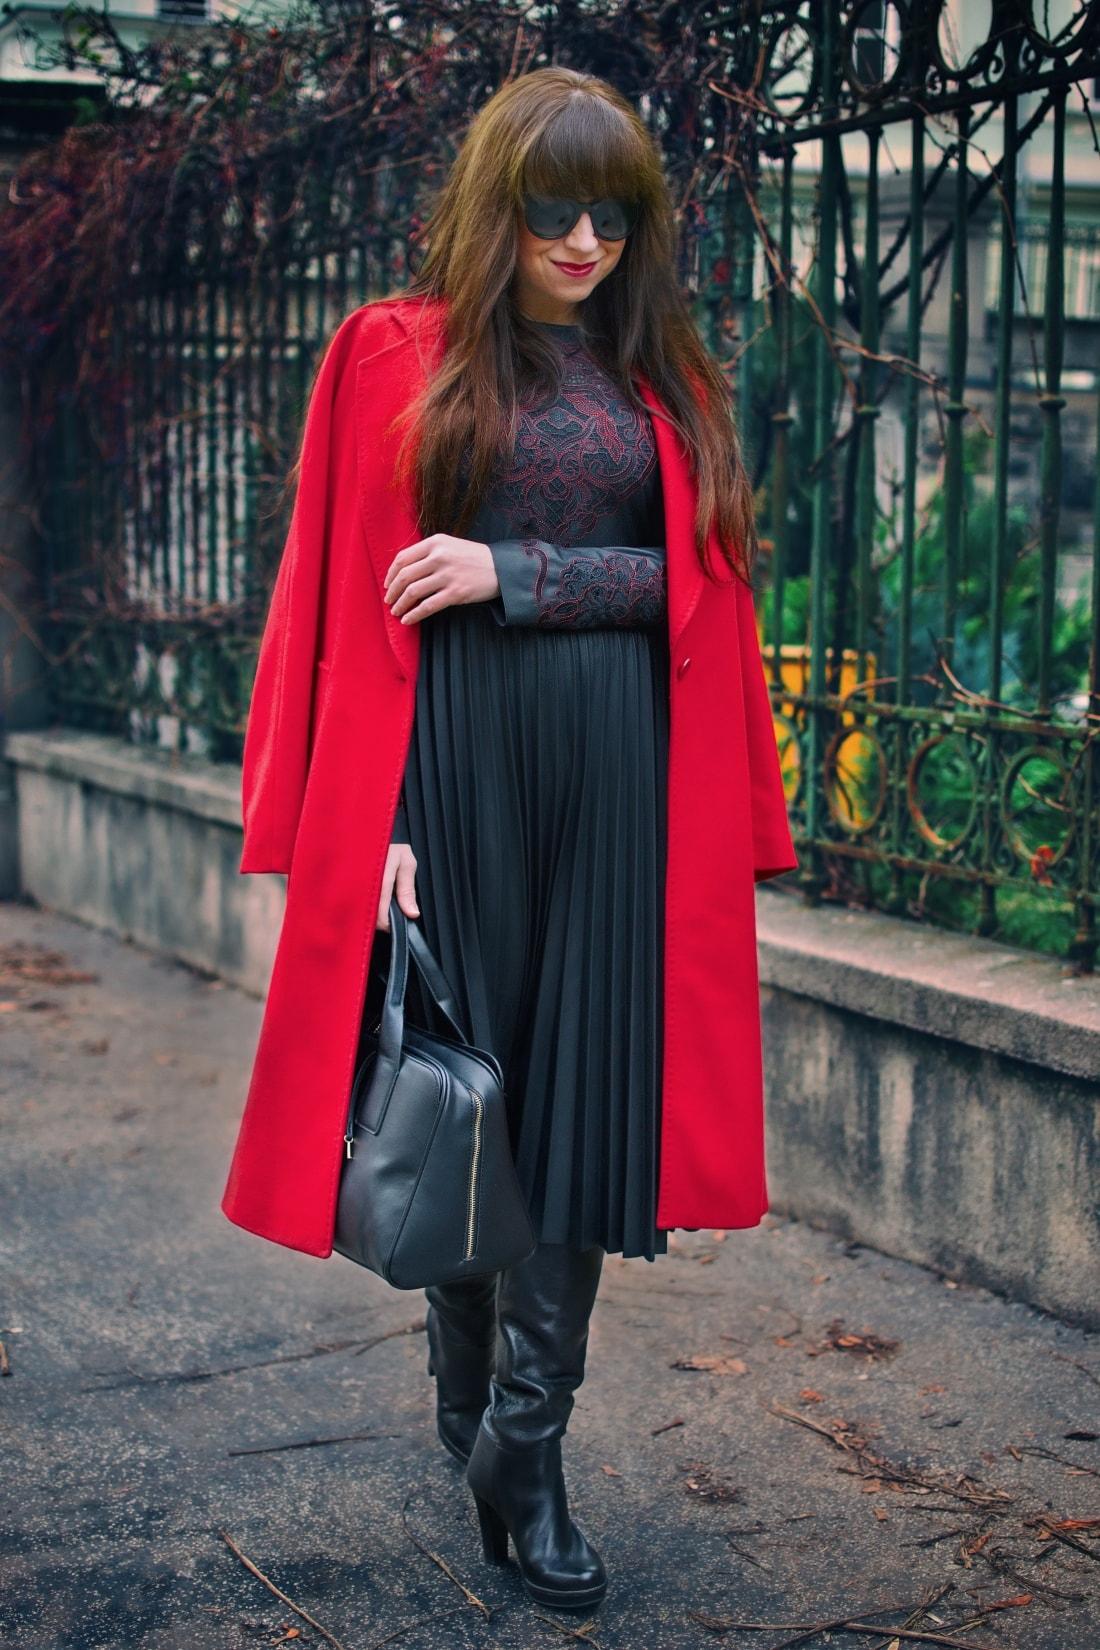 Čierne plisované šaty_Katharine-fashion is beautiful_blog 7_Červený kabát Zara_Kabelka Parfois_Katarína Jakubčová_Fashion blogger